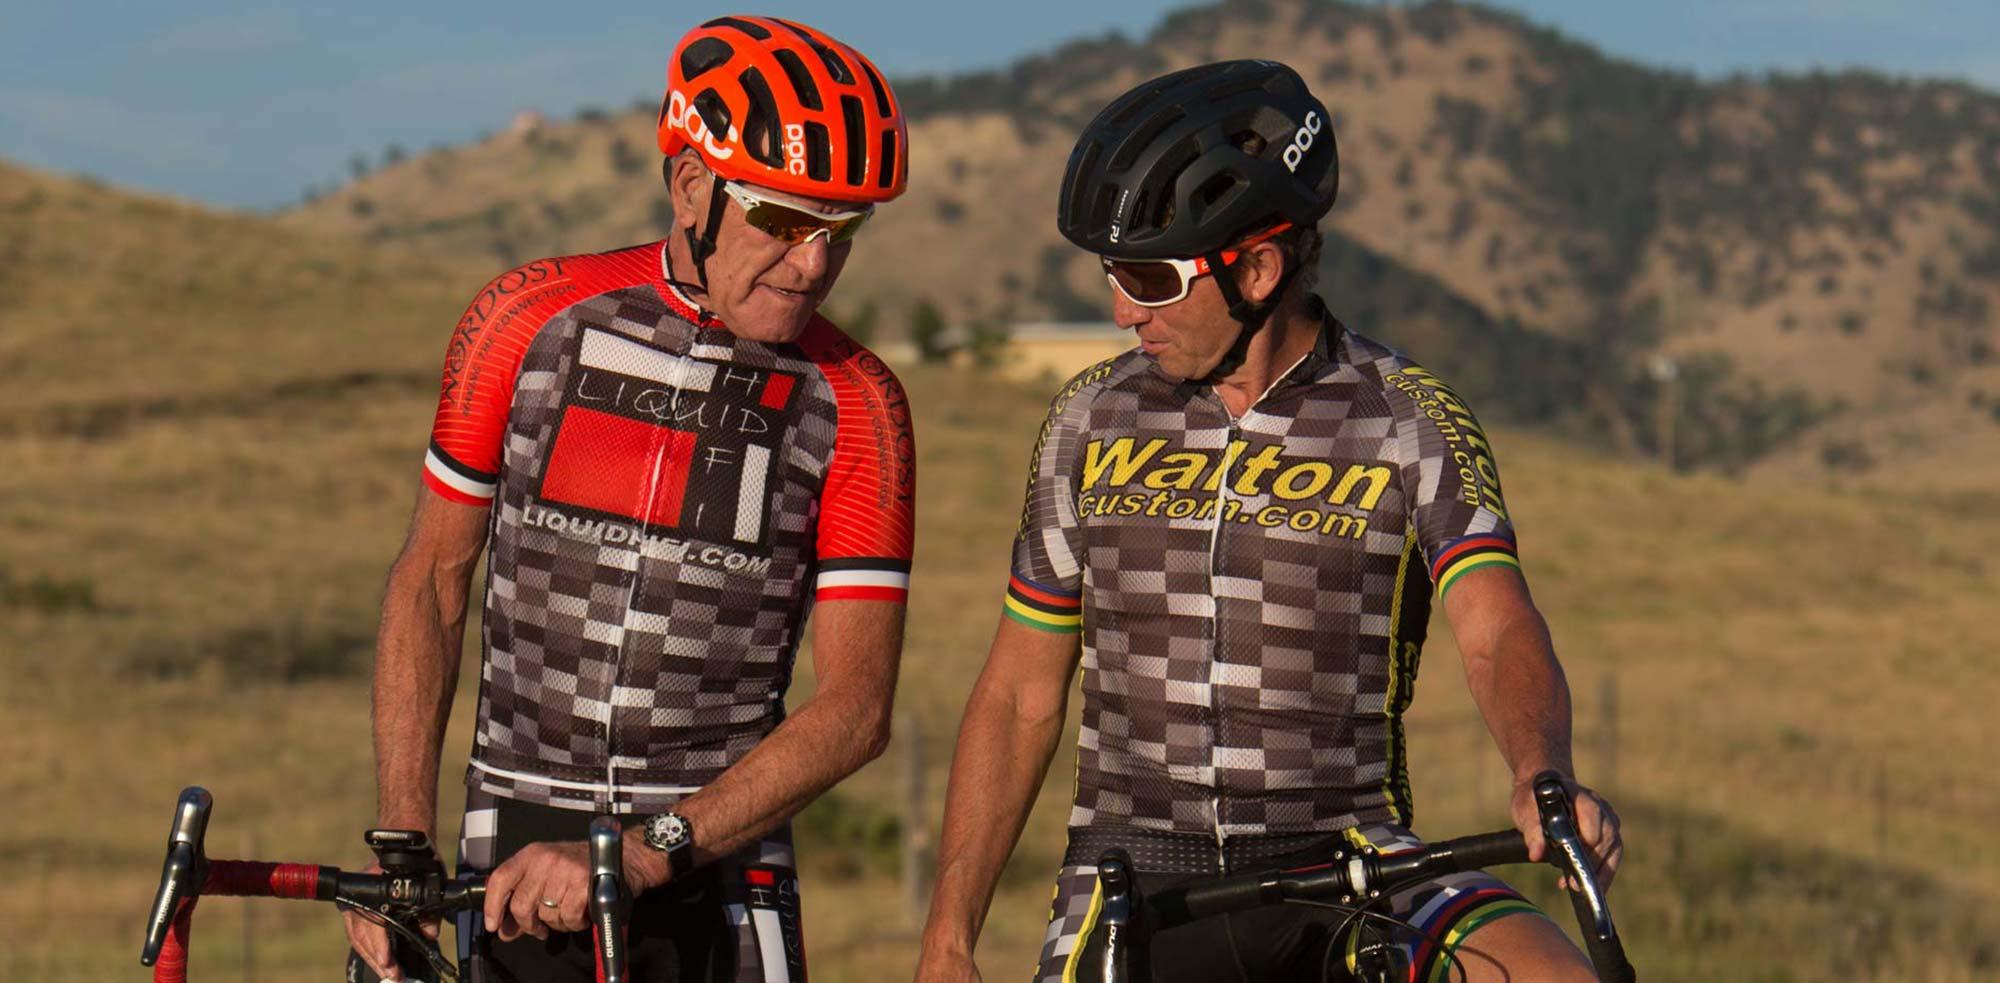 slide-walton-custom-cycling-gear